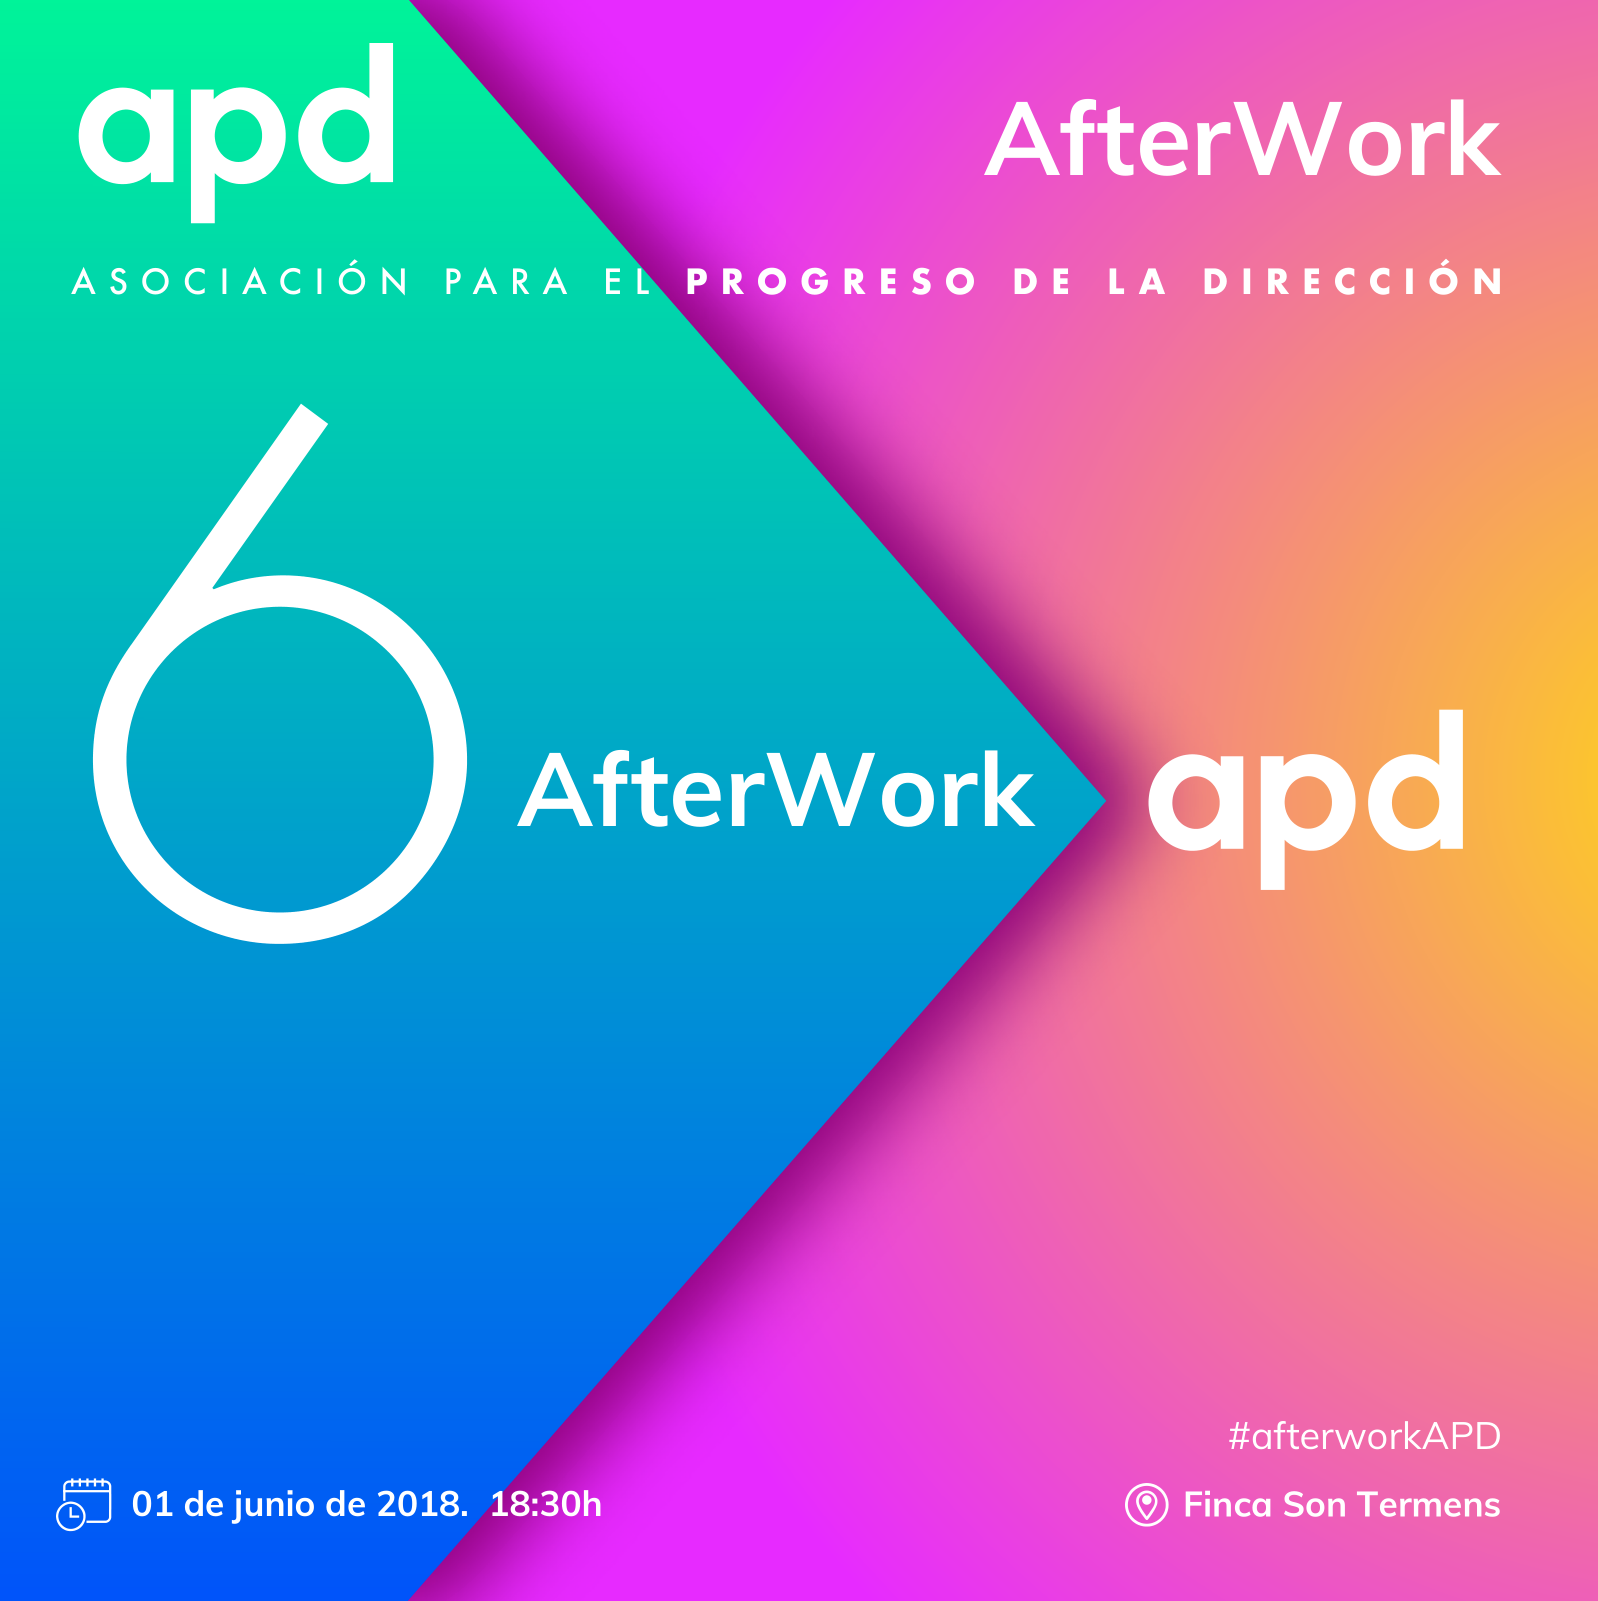 portada-afterwork-apd